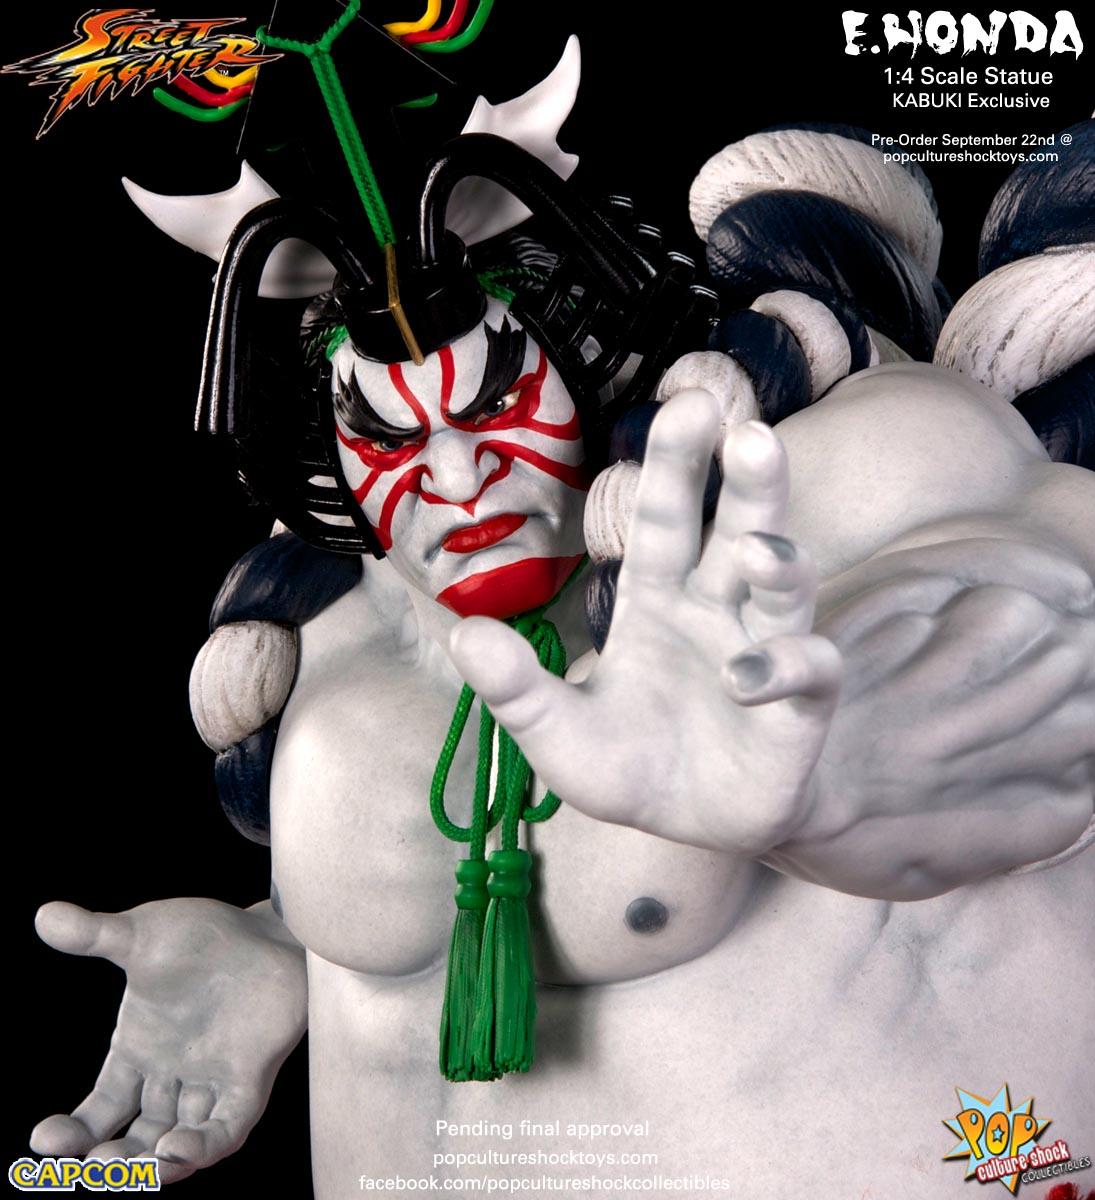 [Pop Culture Shock] Street Fighter: E. Honda 1/4 Statue - Página 3 Street-Fighter-E.-Honda-Kabuki-Statue-024